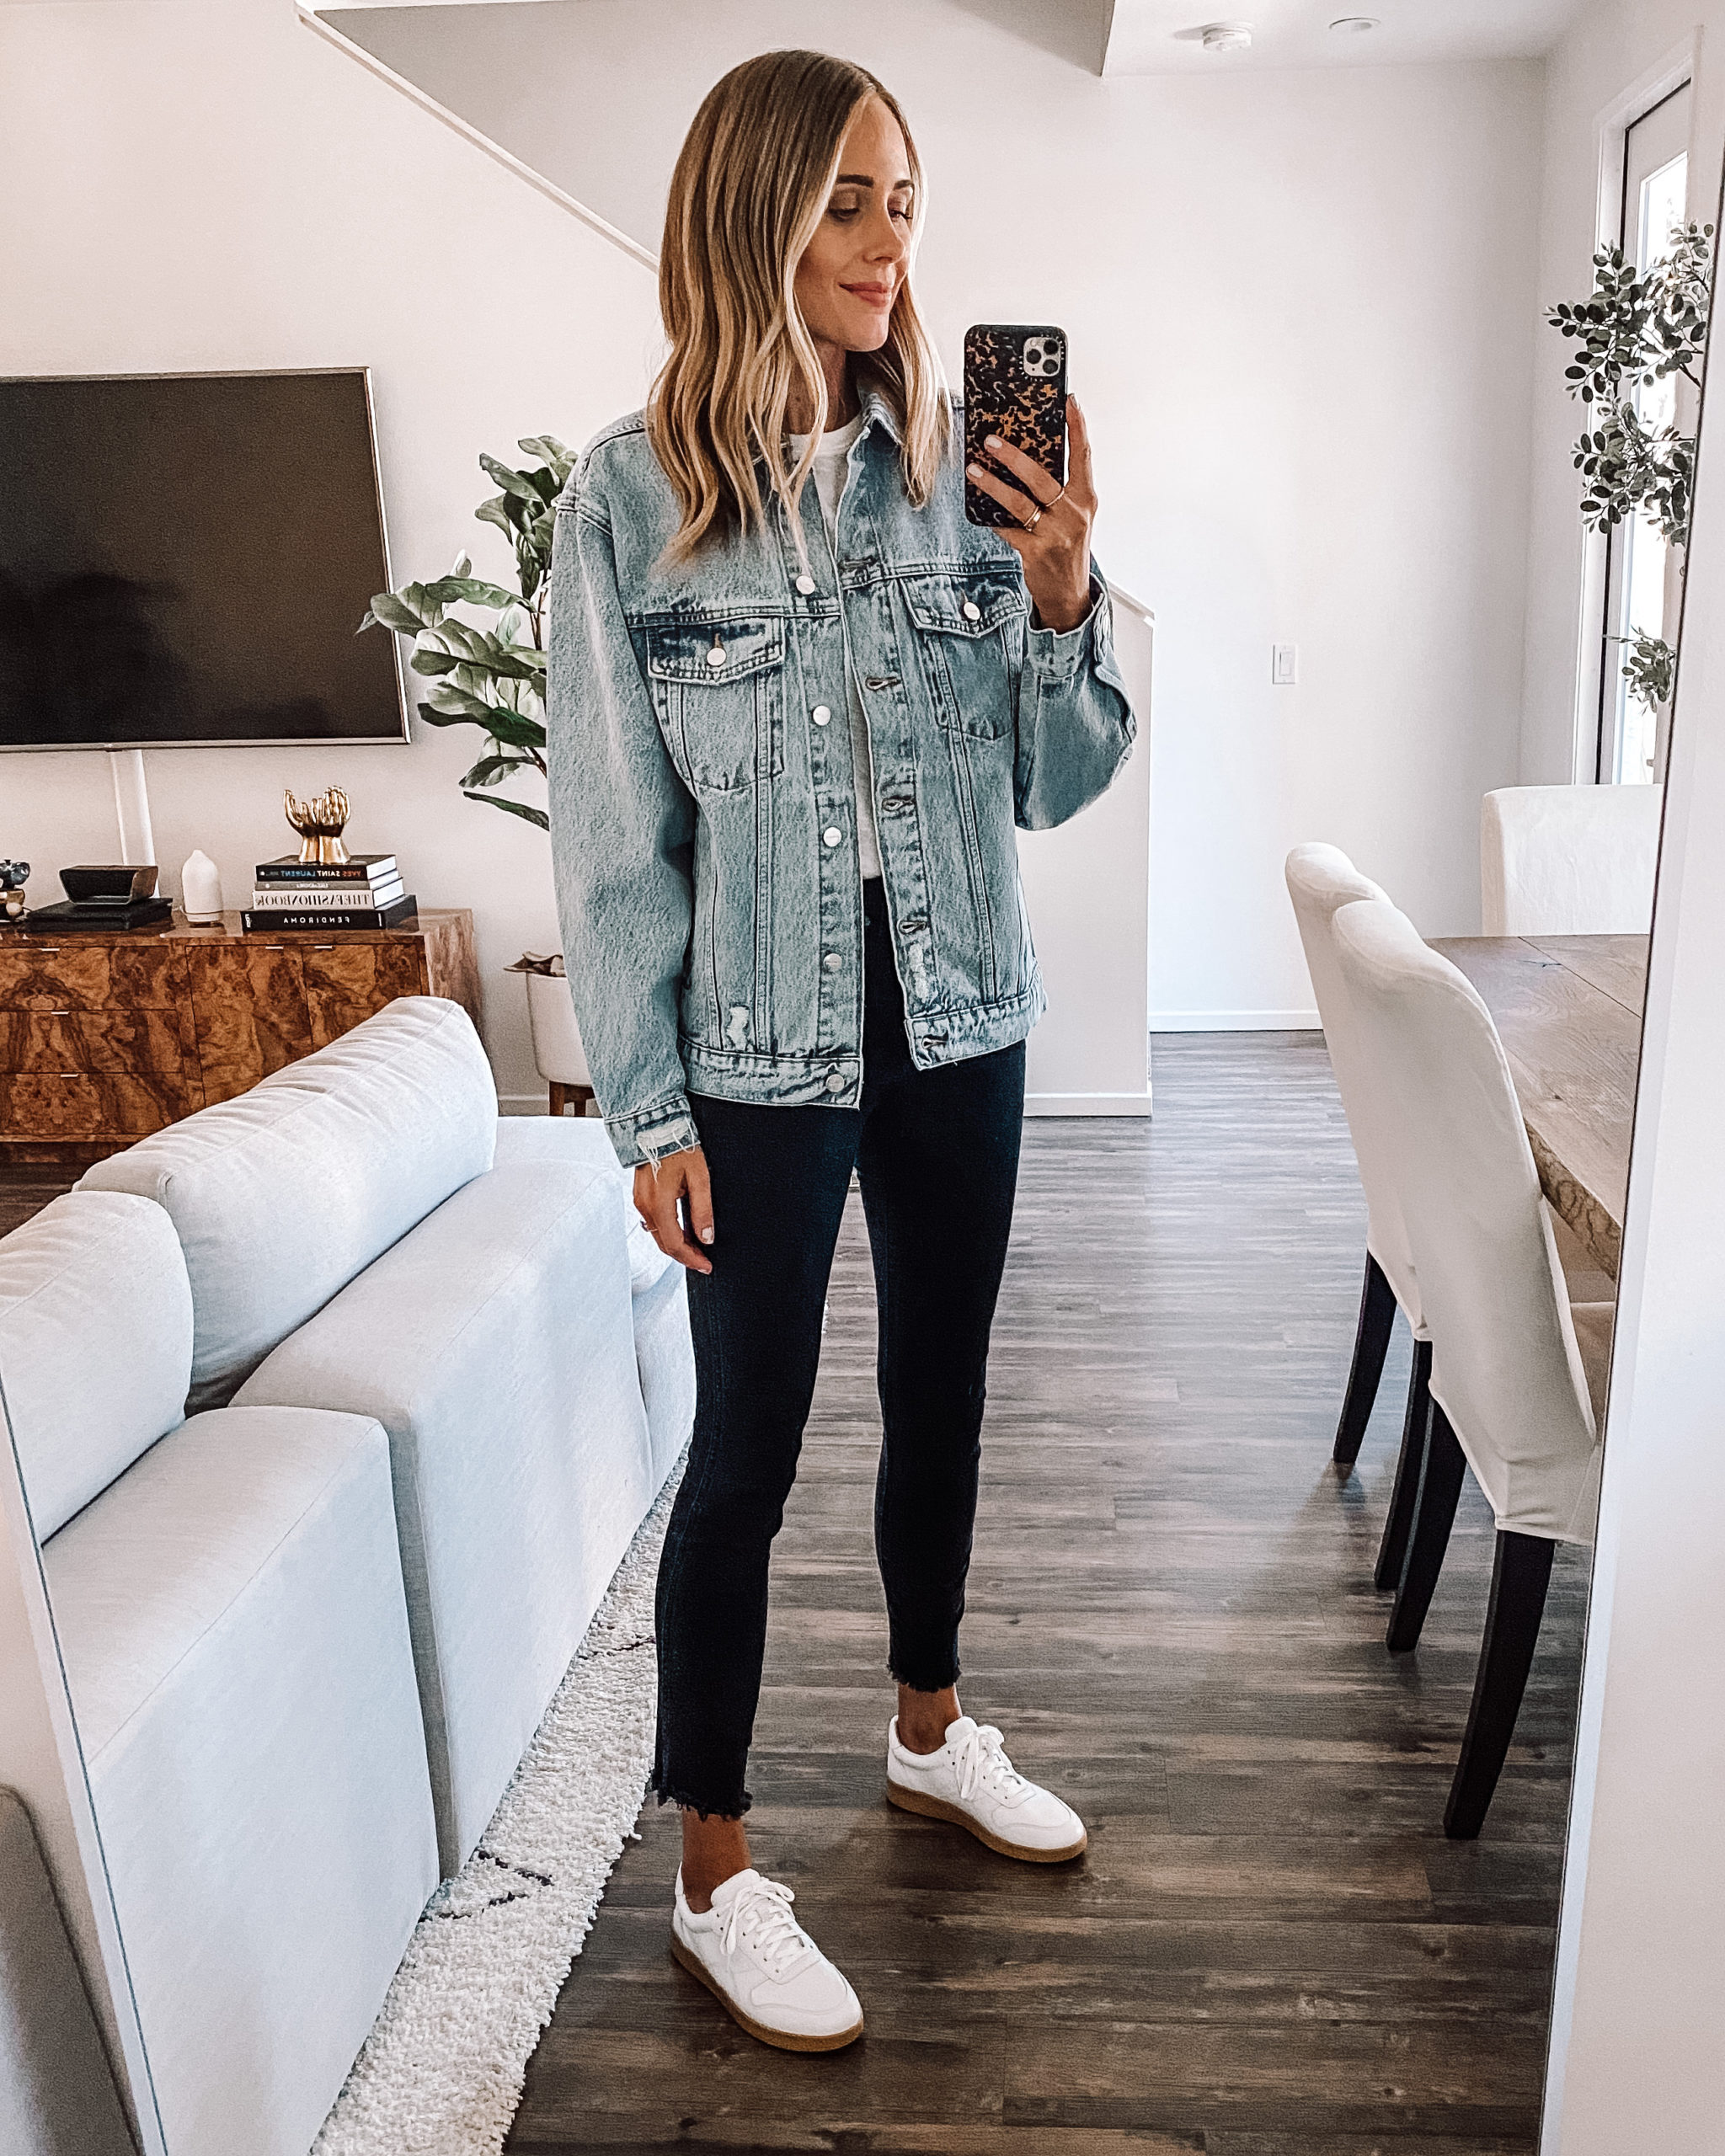 Fashion Jackson Wearing Anime Bing Oversized Light Wash Denim Jacket White Tshirt Black Skinny Jeans Everlane White Sneakers